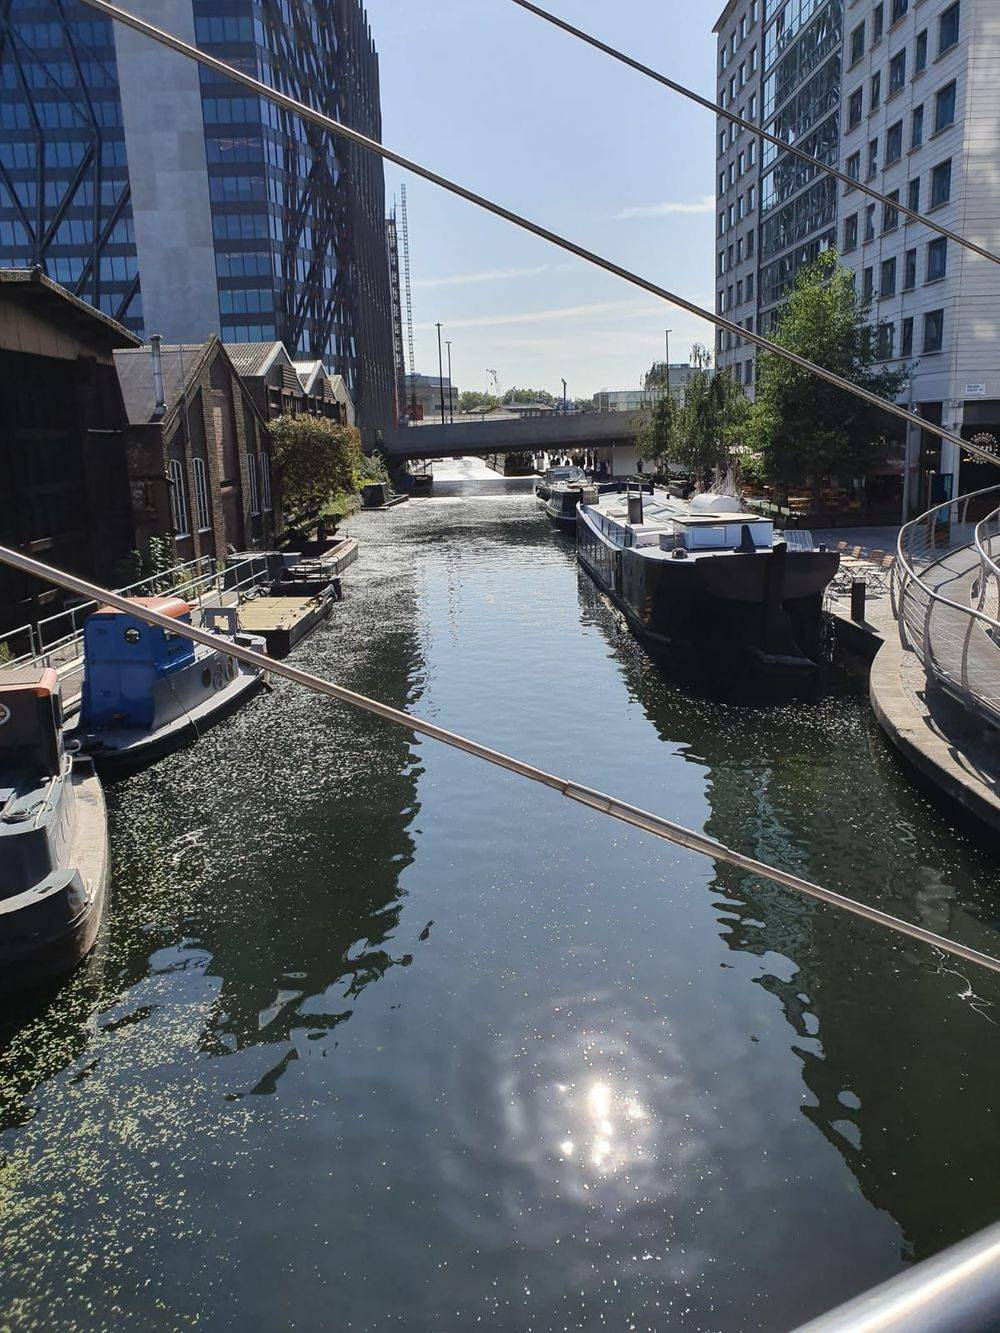 paddington basin,  ,grand union canal london, regent's canal london  ,canal walks in london ,family friendly walks in london ,romantic walks in london ,romantic london ,robert browning, browning's pool ,little venice london, british & far east traders